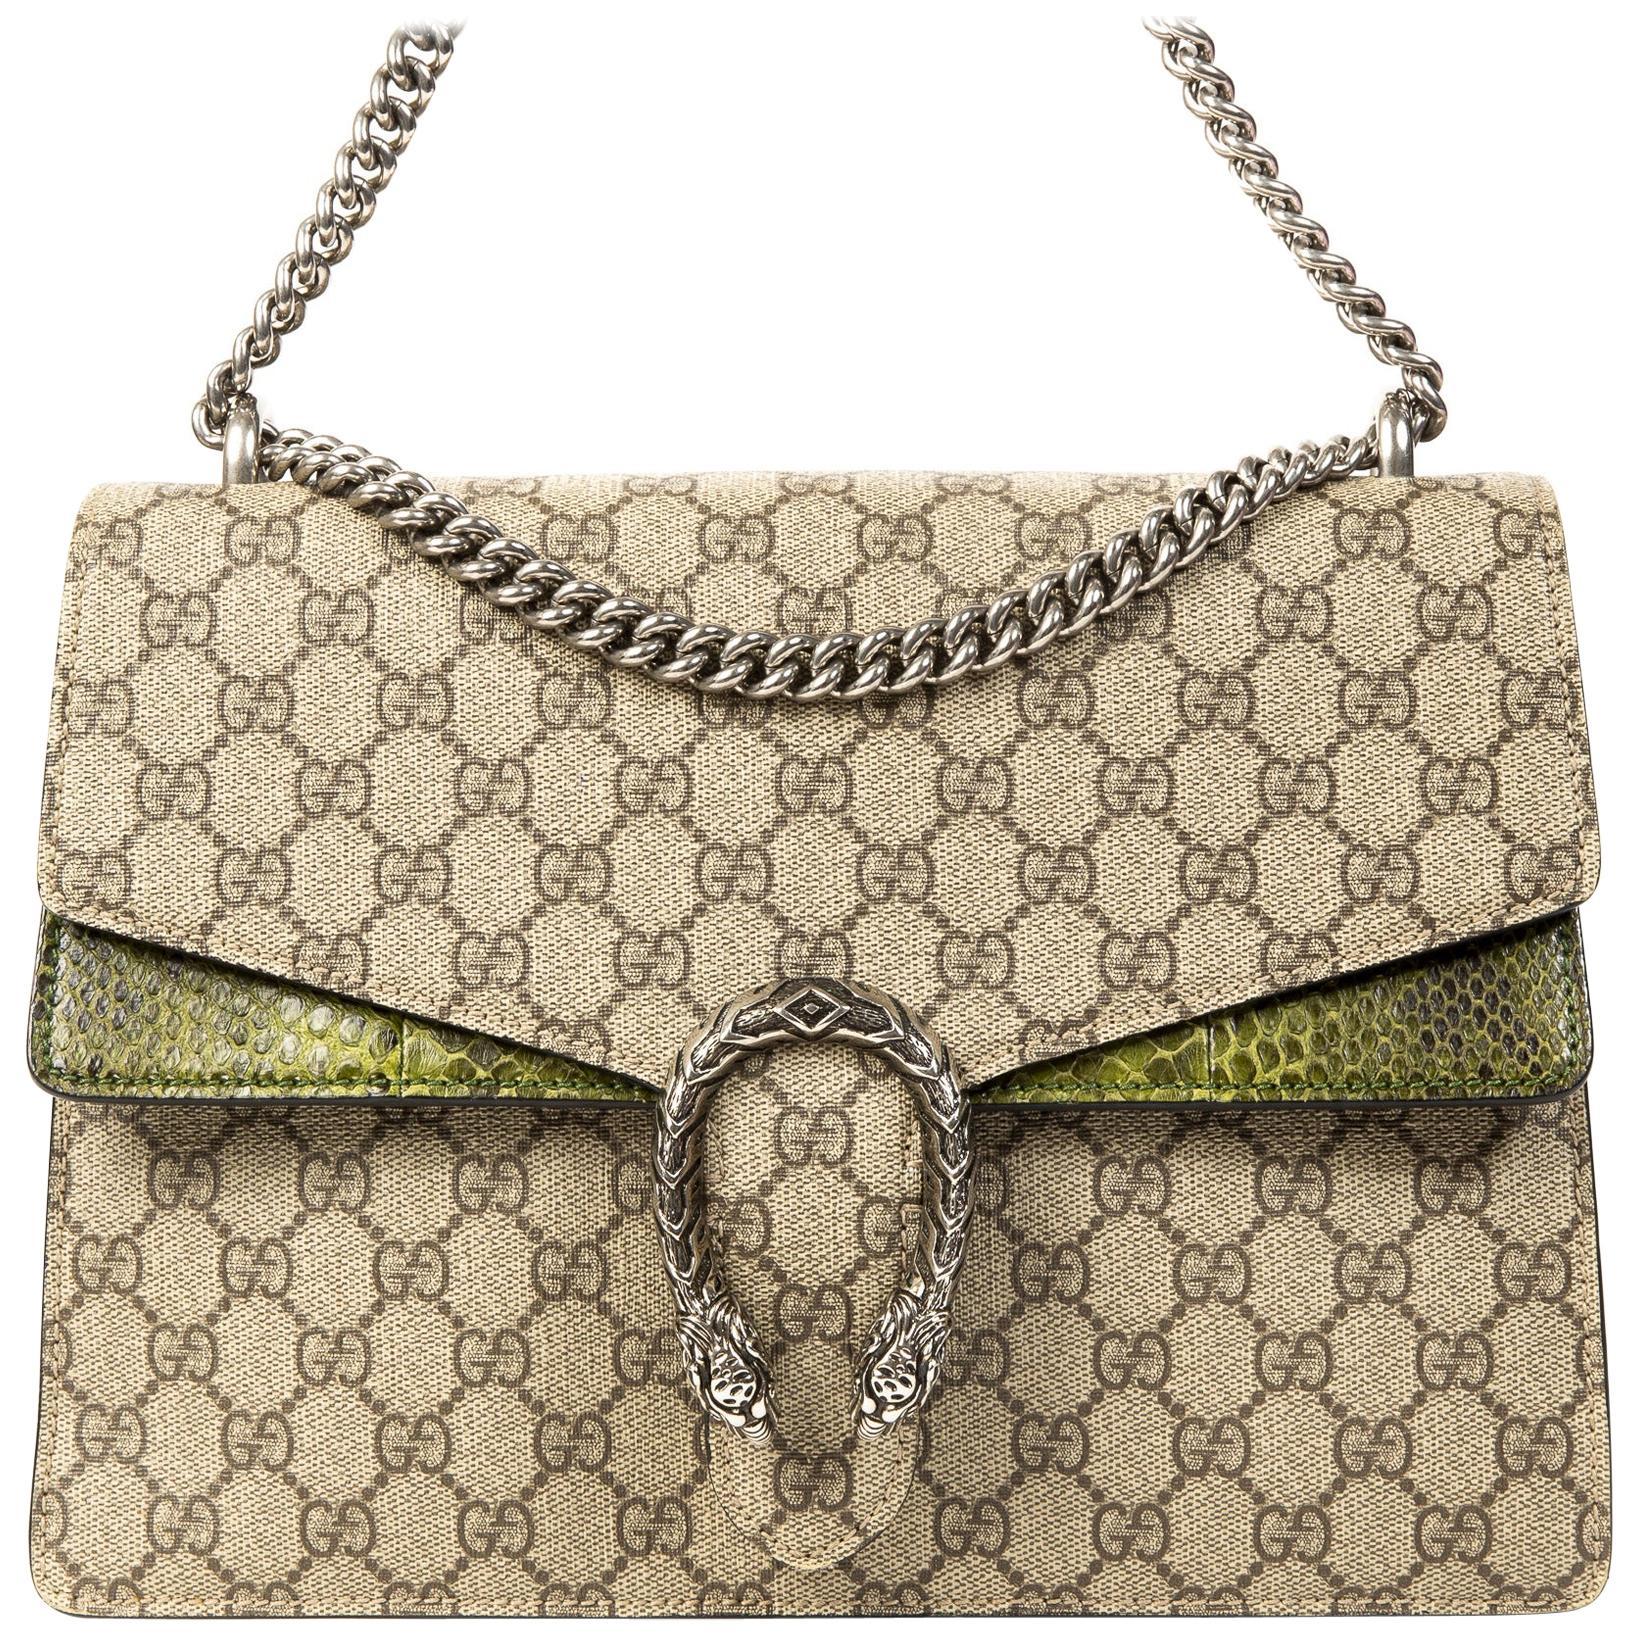 Gucci GG Supreme Monogram Python Dionysus